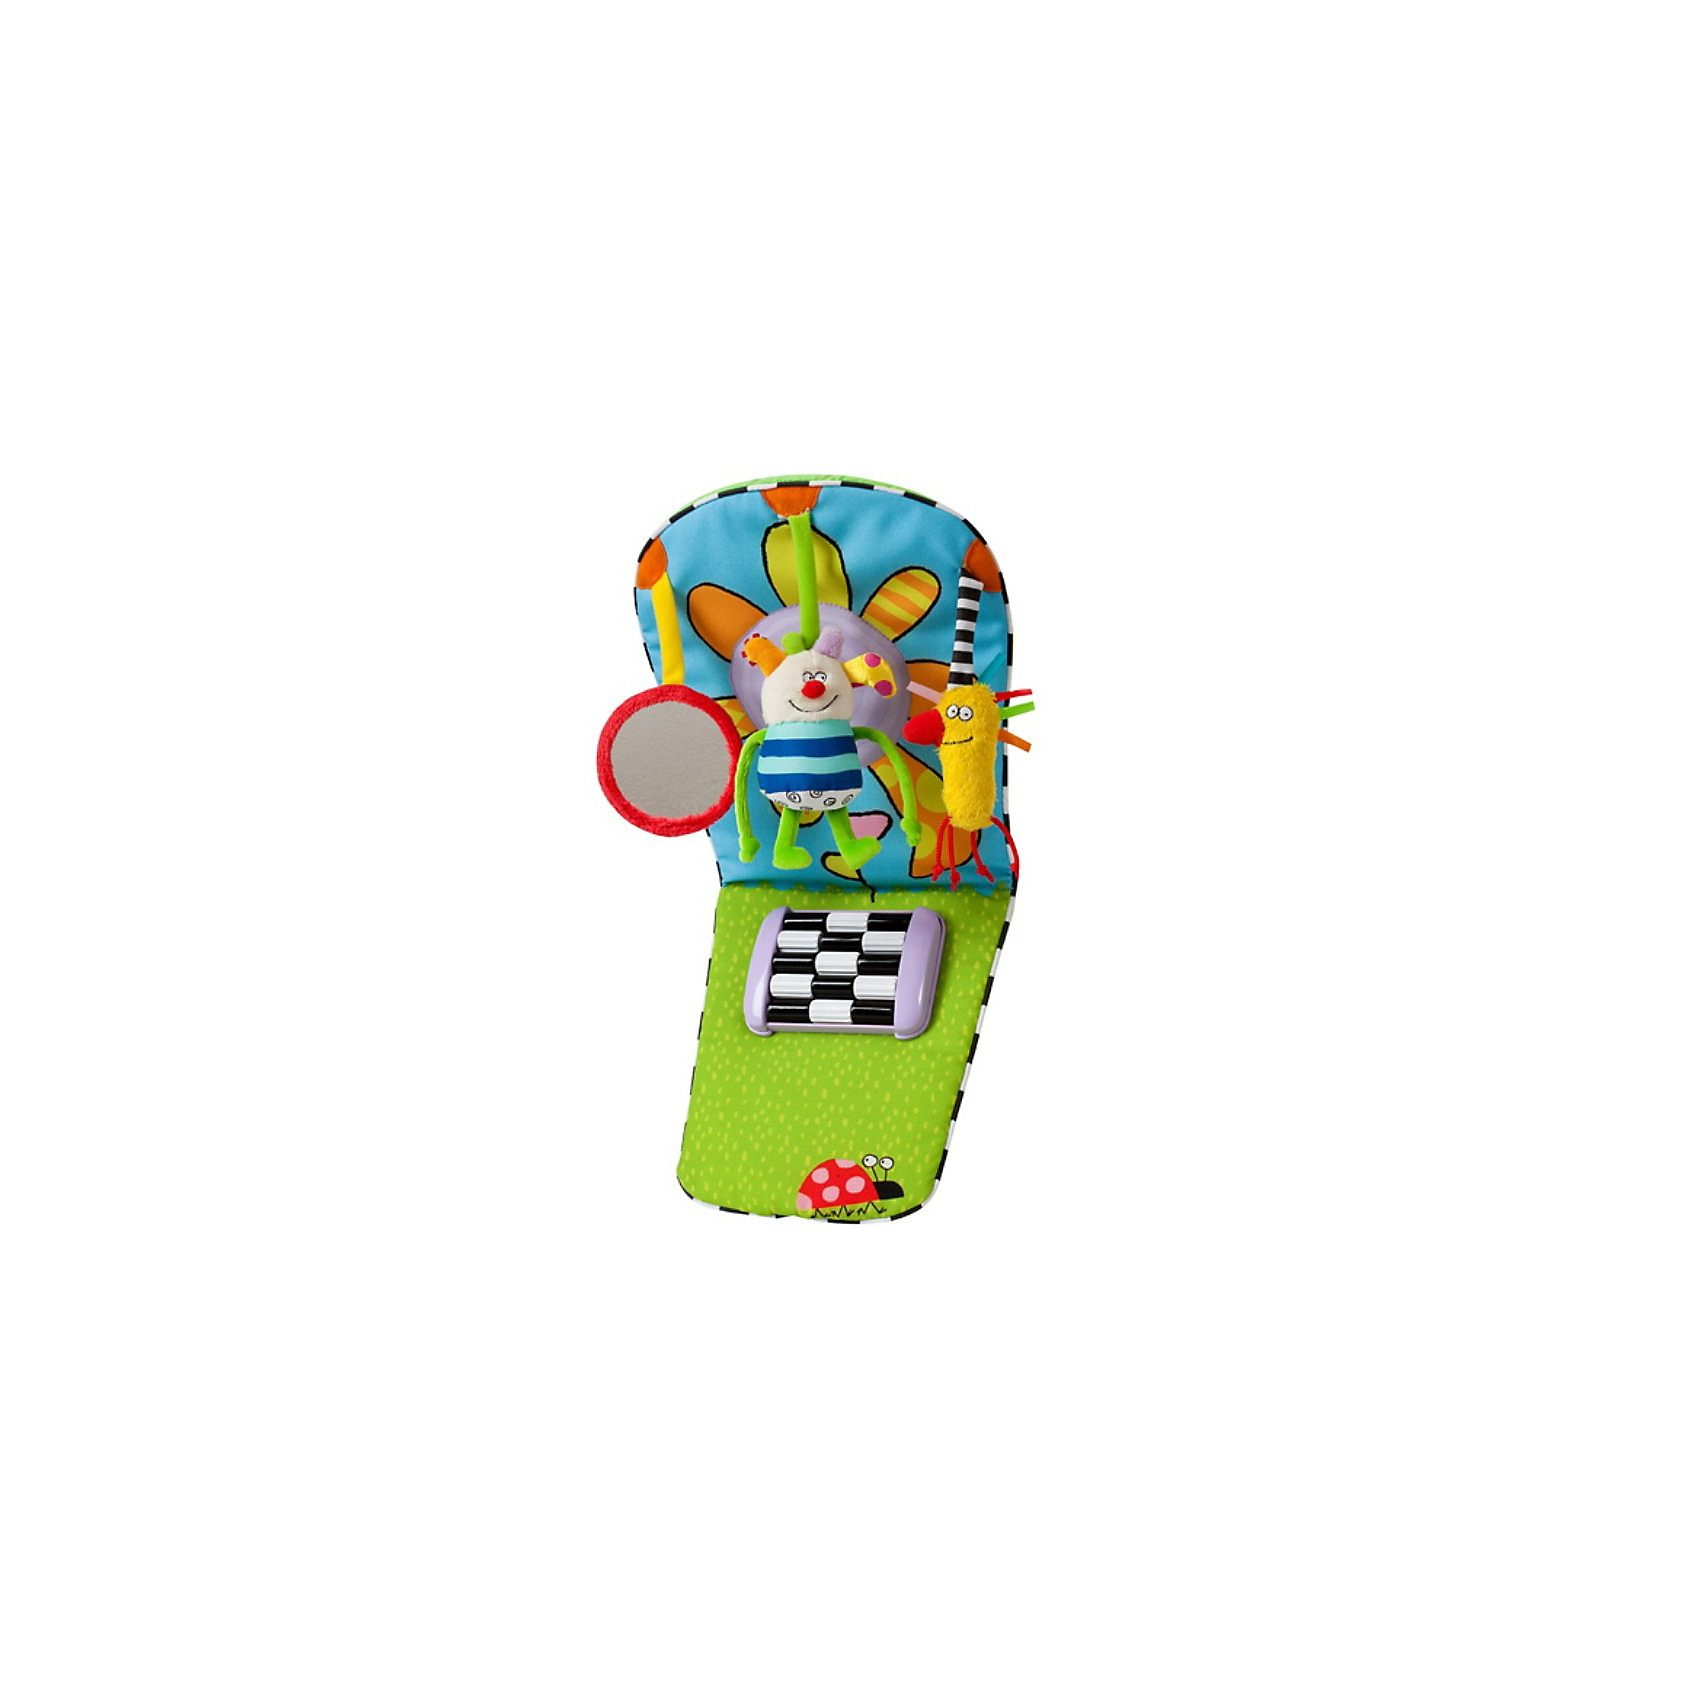 TAF TOYS 11465 Autospielzeug Fun Kooky